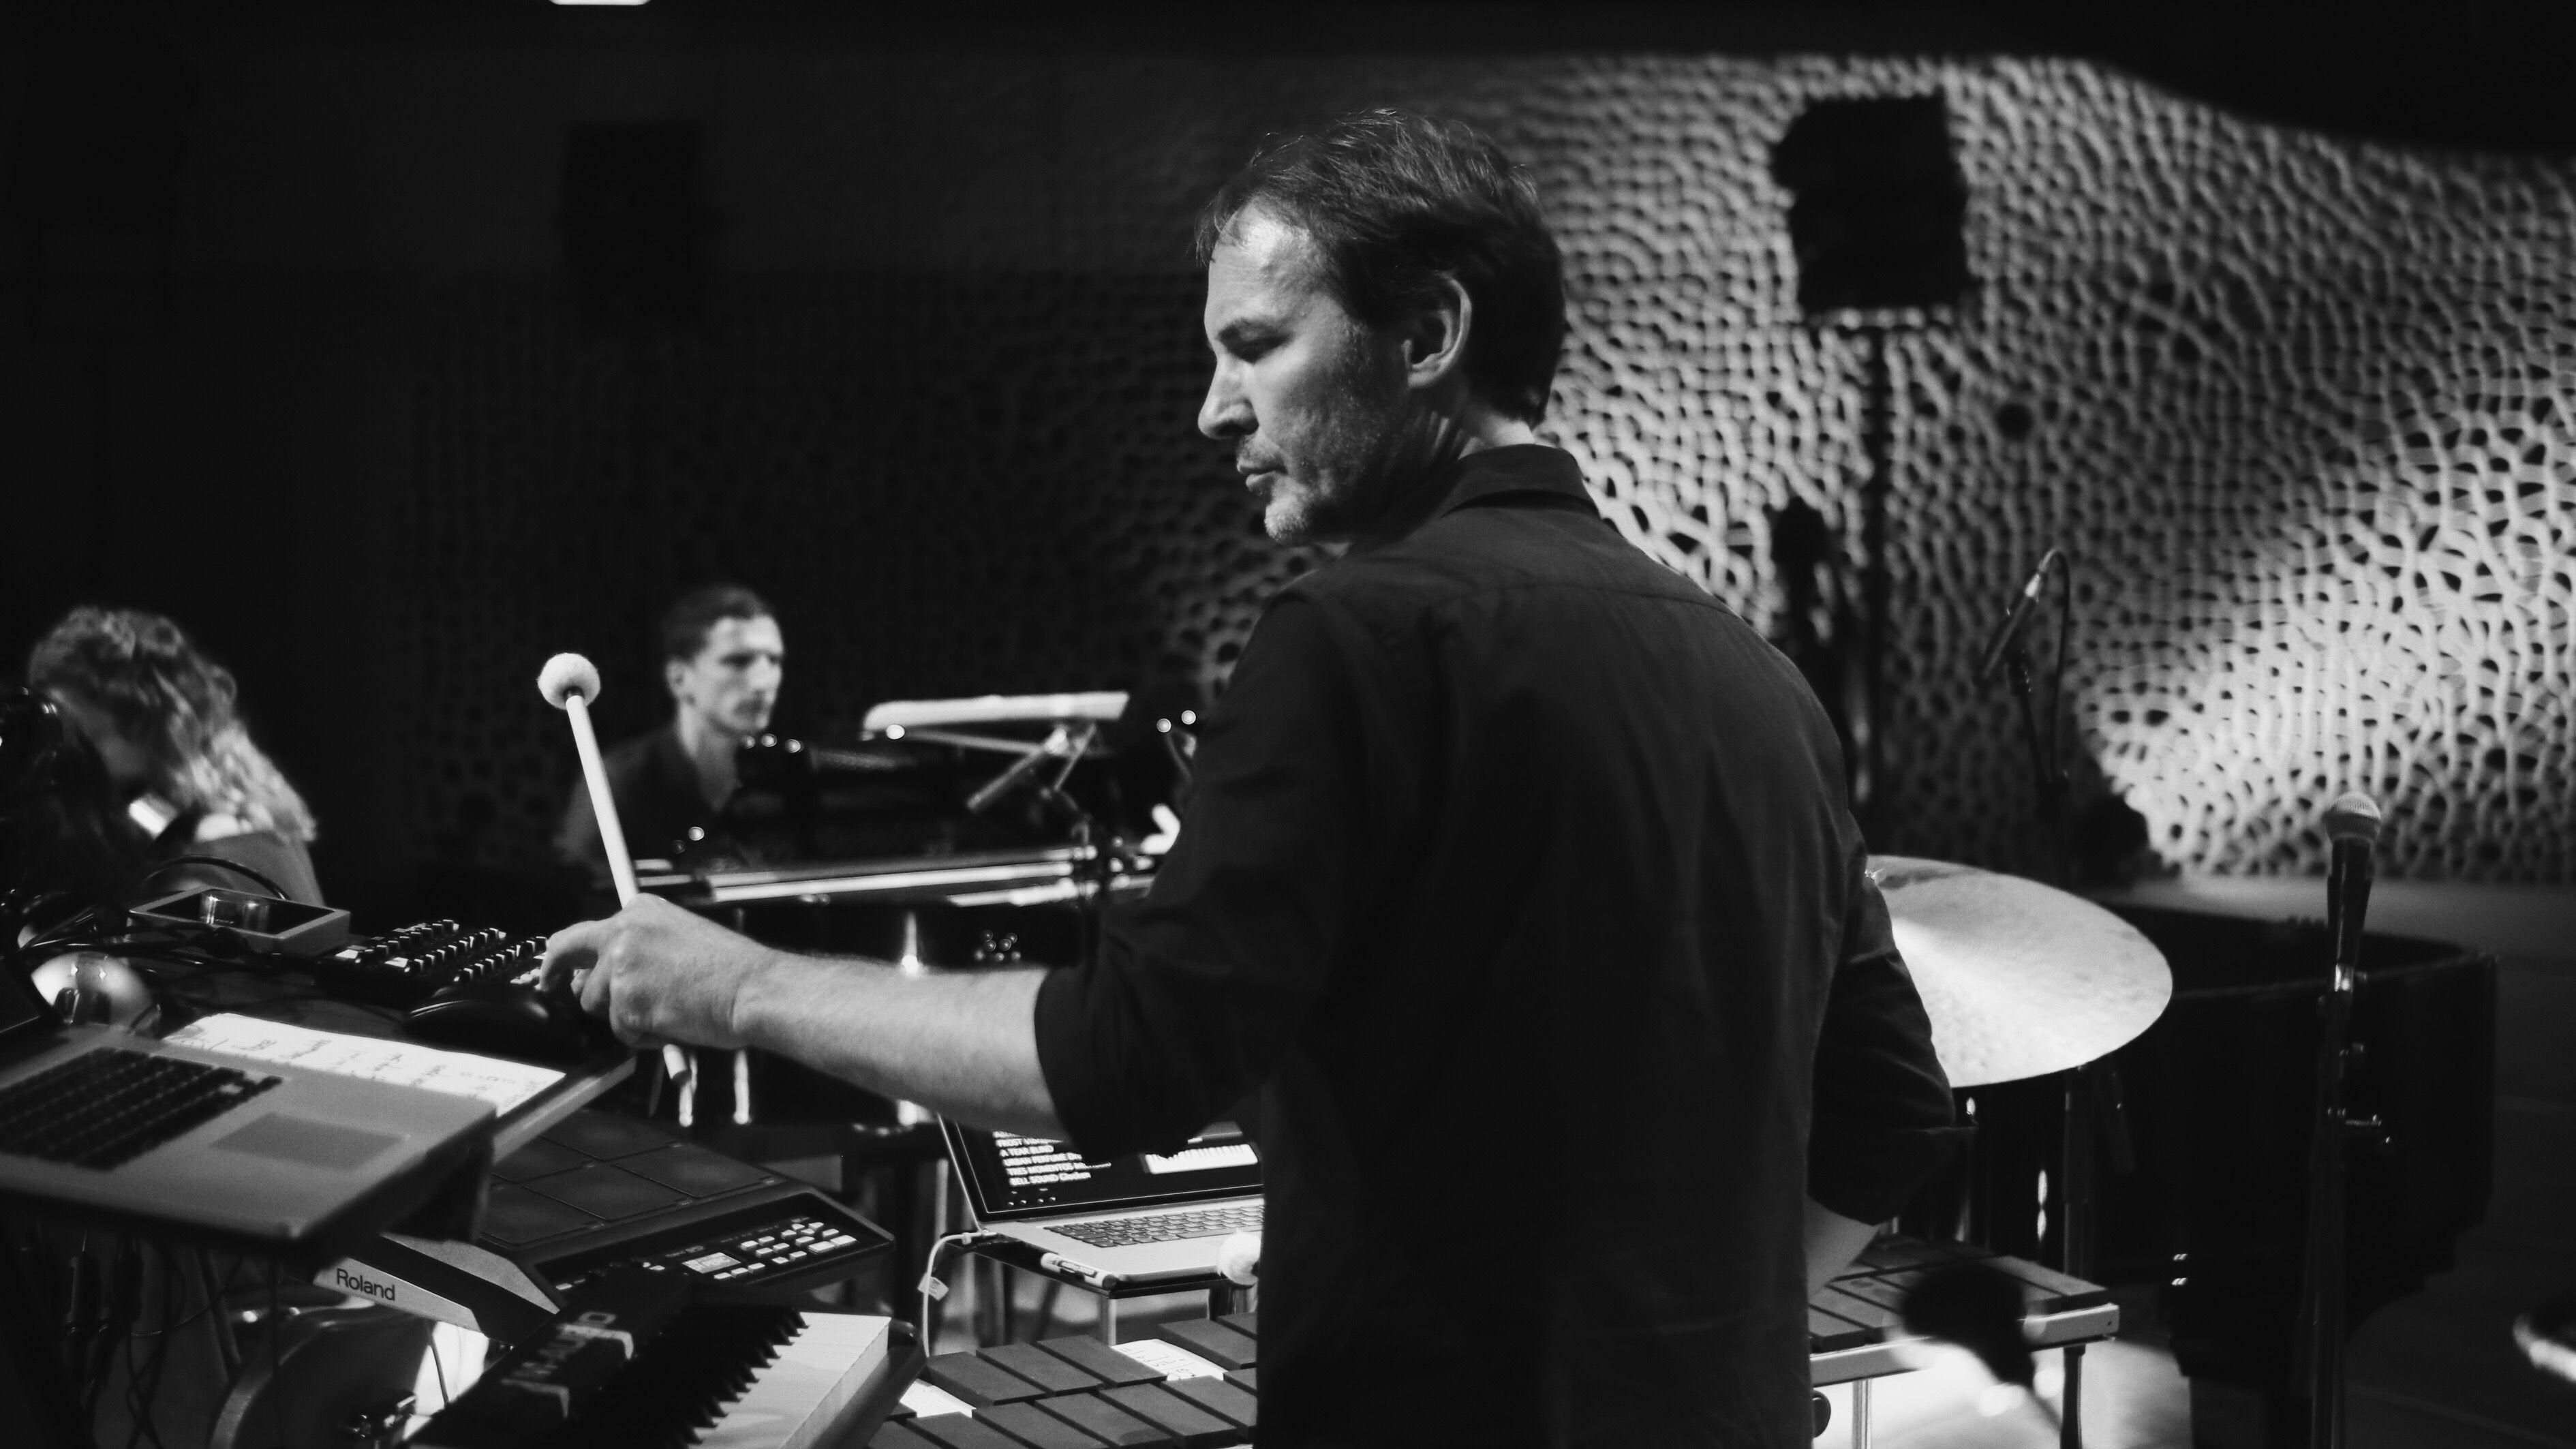 Sven Helbig & Forrklang Quartett spielen ein Konzert